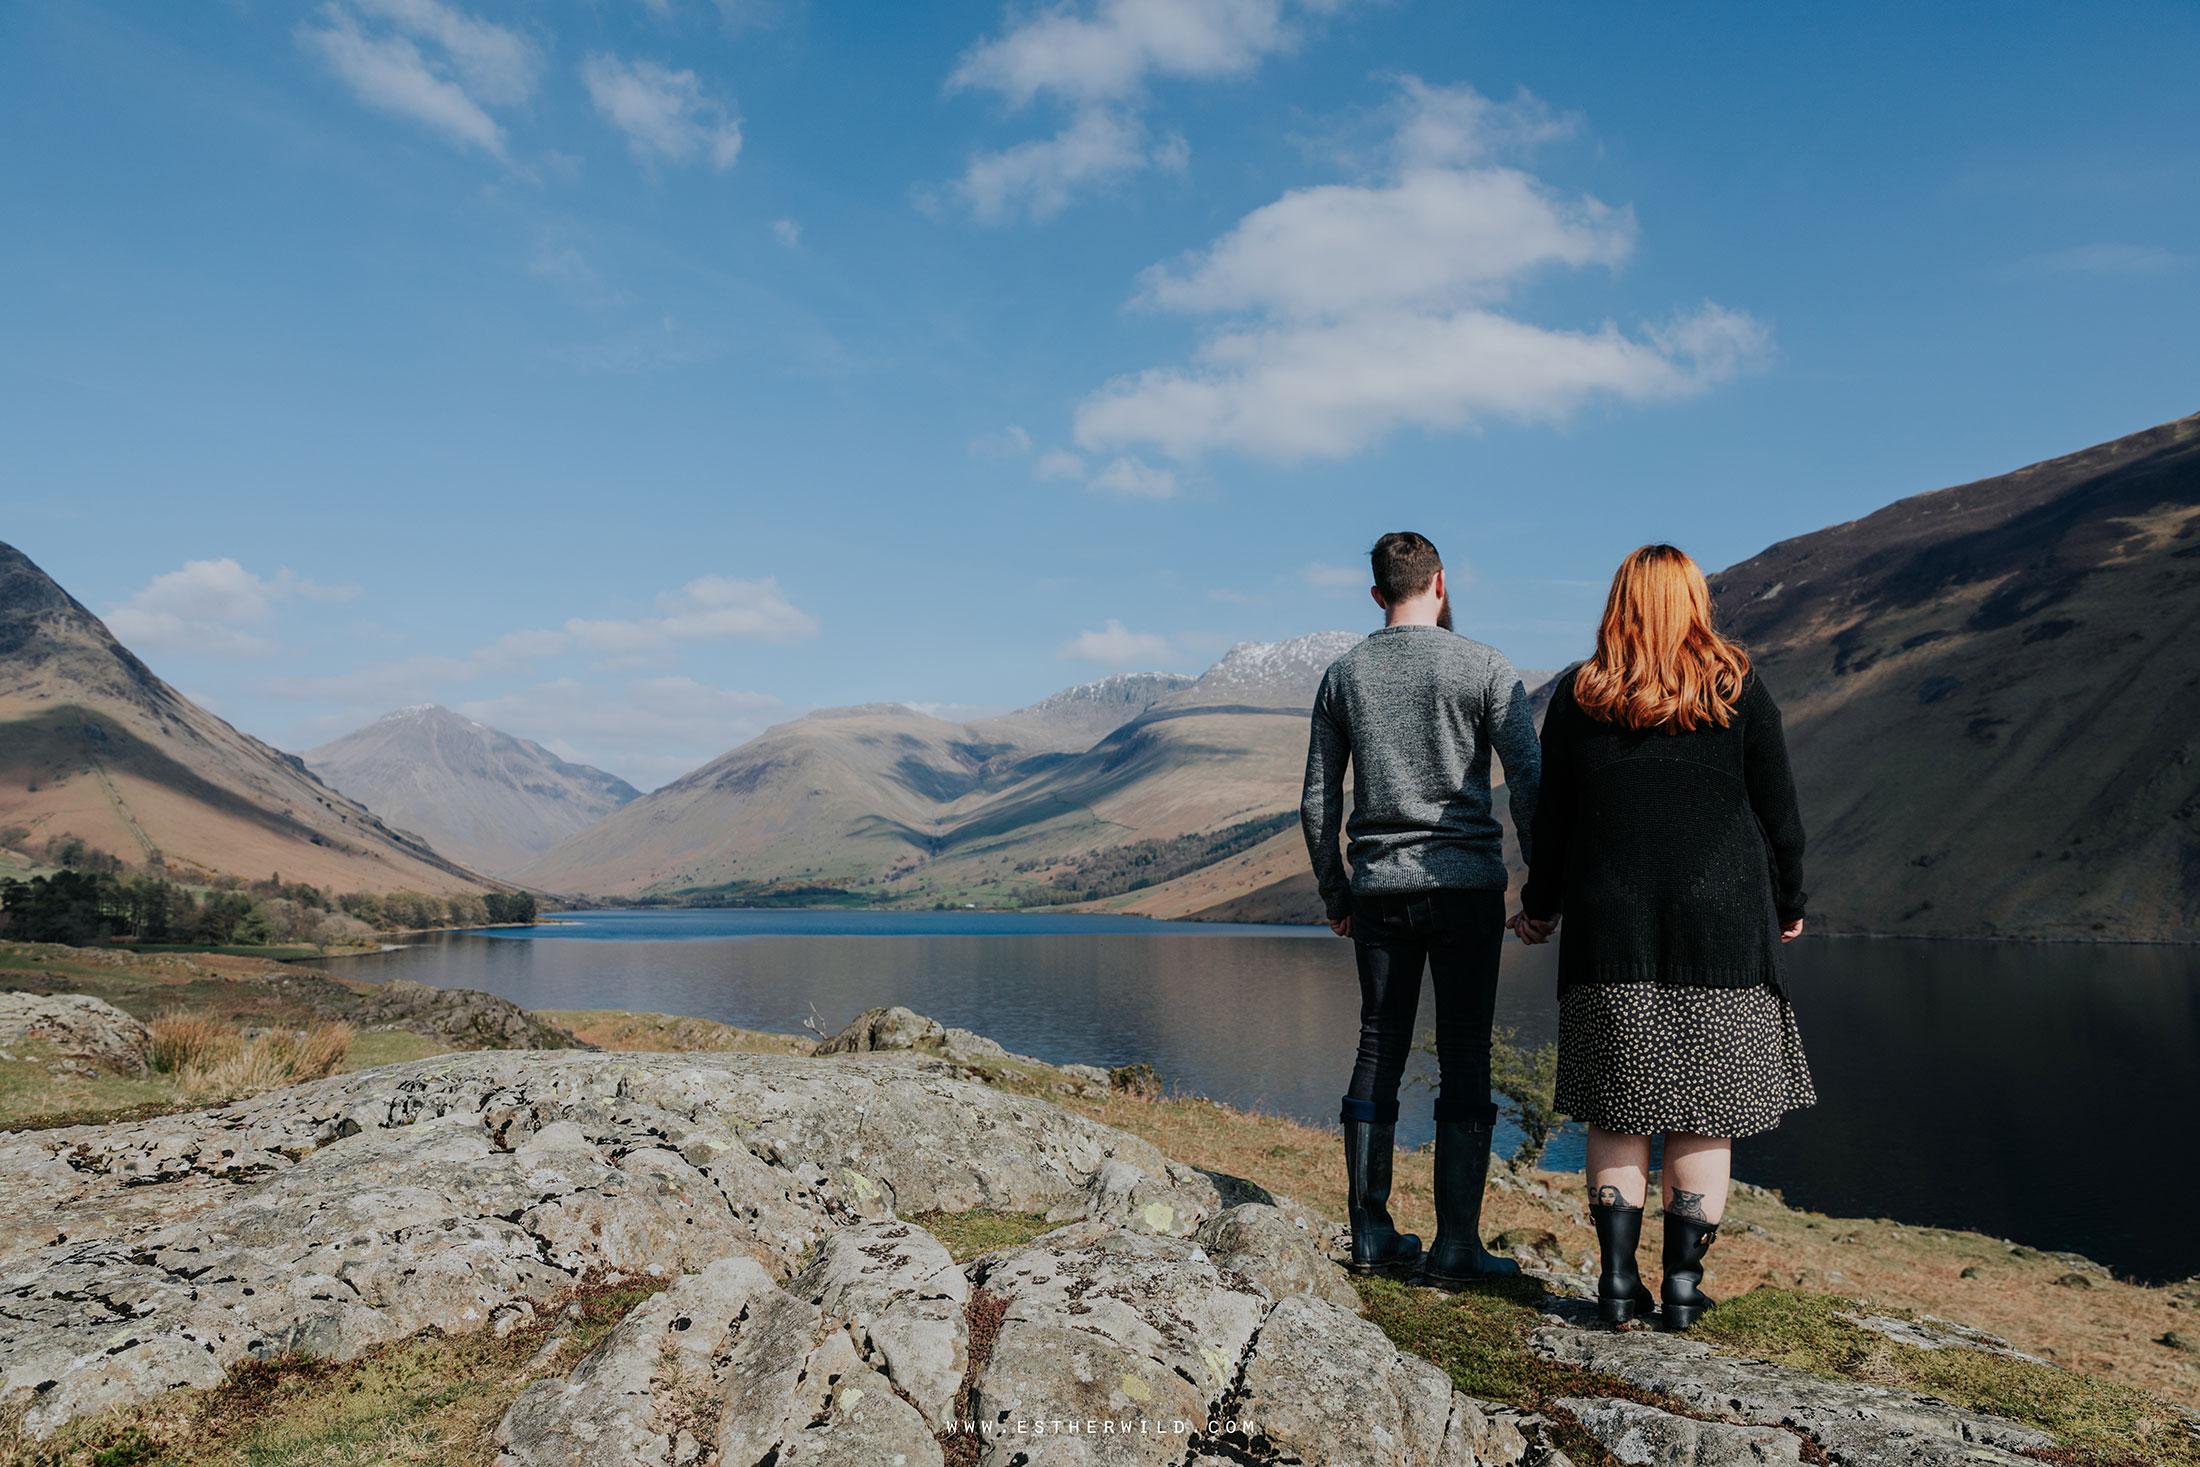 Cumbria_Lake_District_Wasdale_Wedding_Photographer_Destination_Engagement_Anniversary_Esther_Wild_IMG_3184.jpg